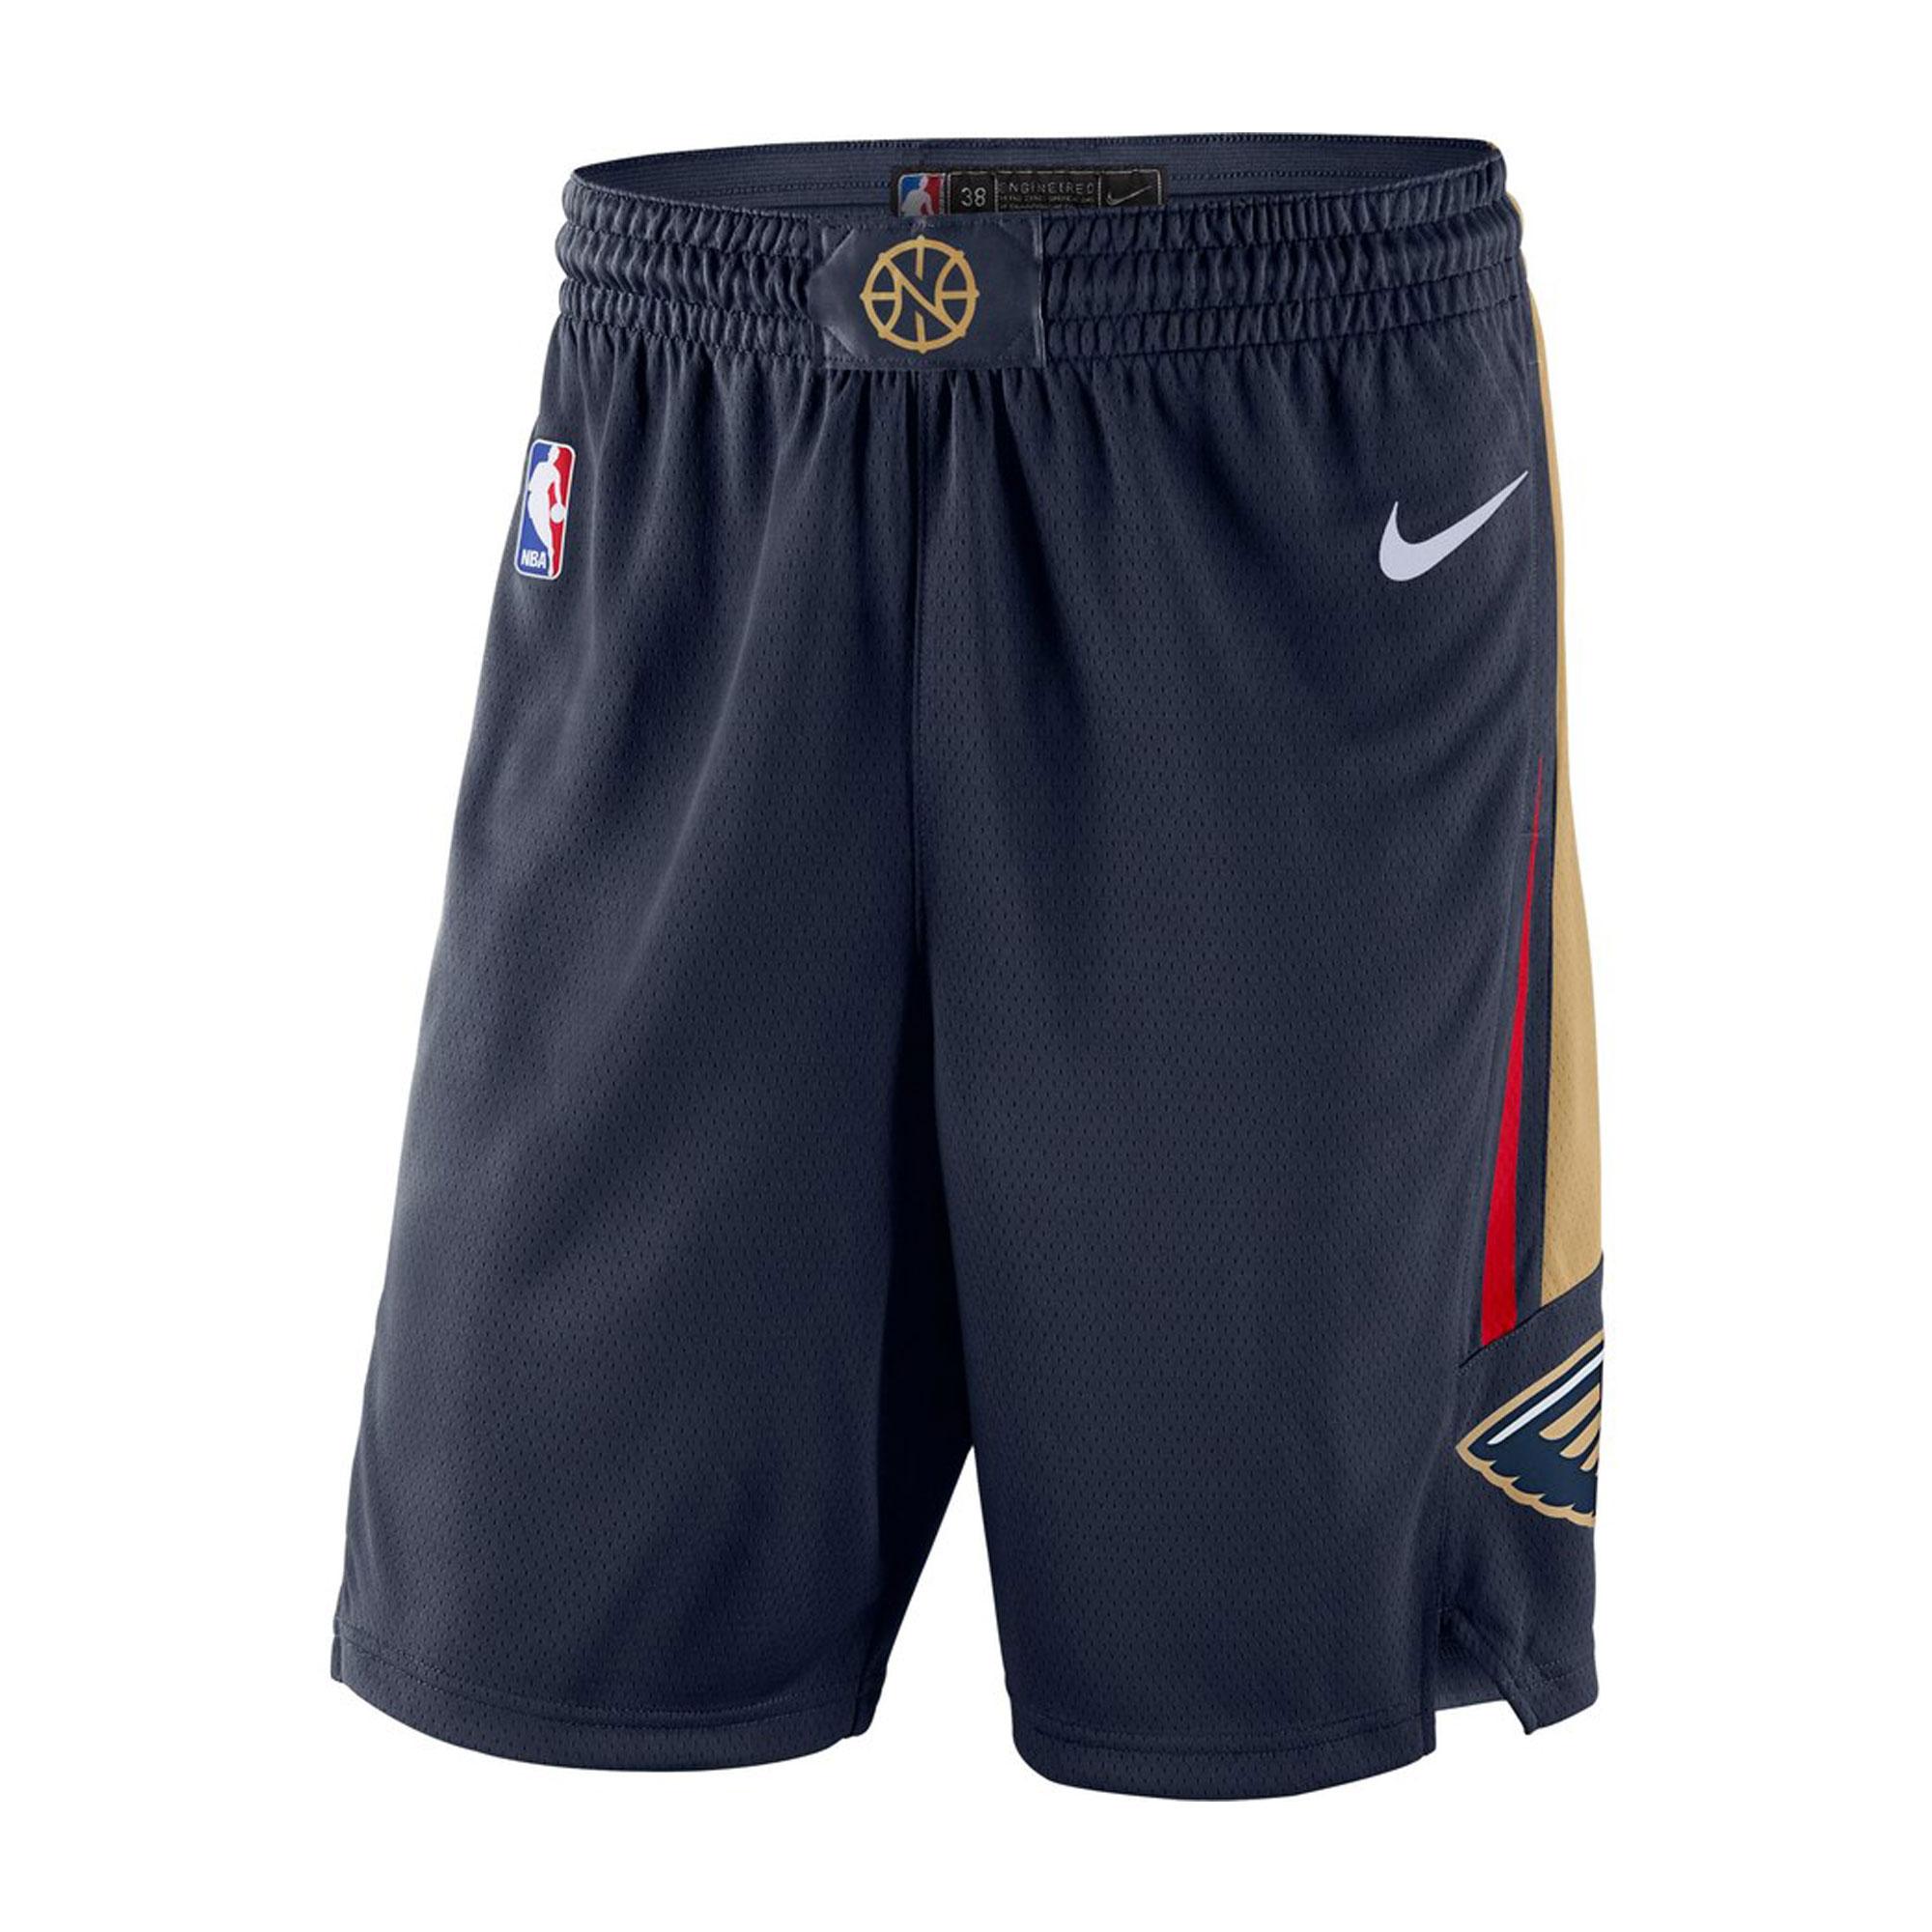 New Orleans Pelicans Short (SRT-NAVY-ORLEANS)